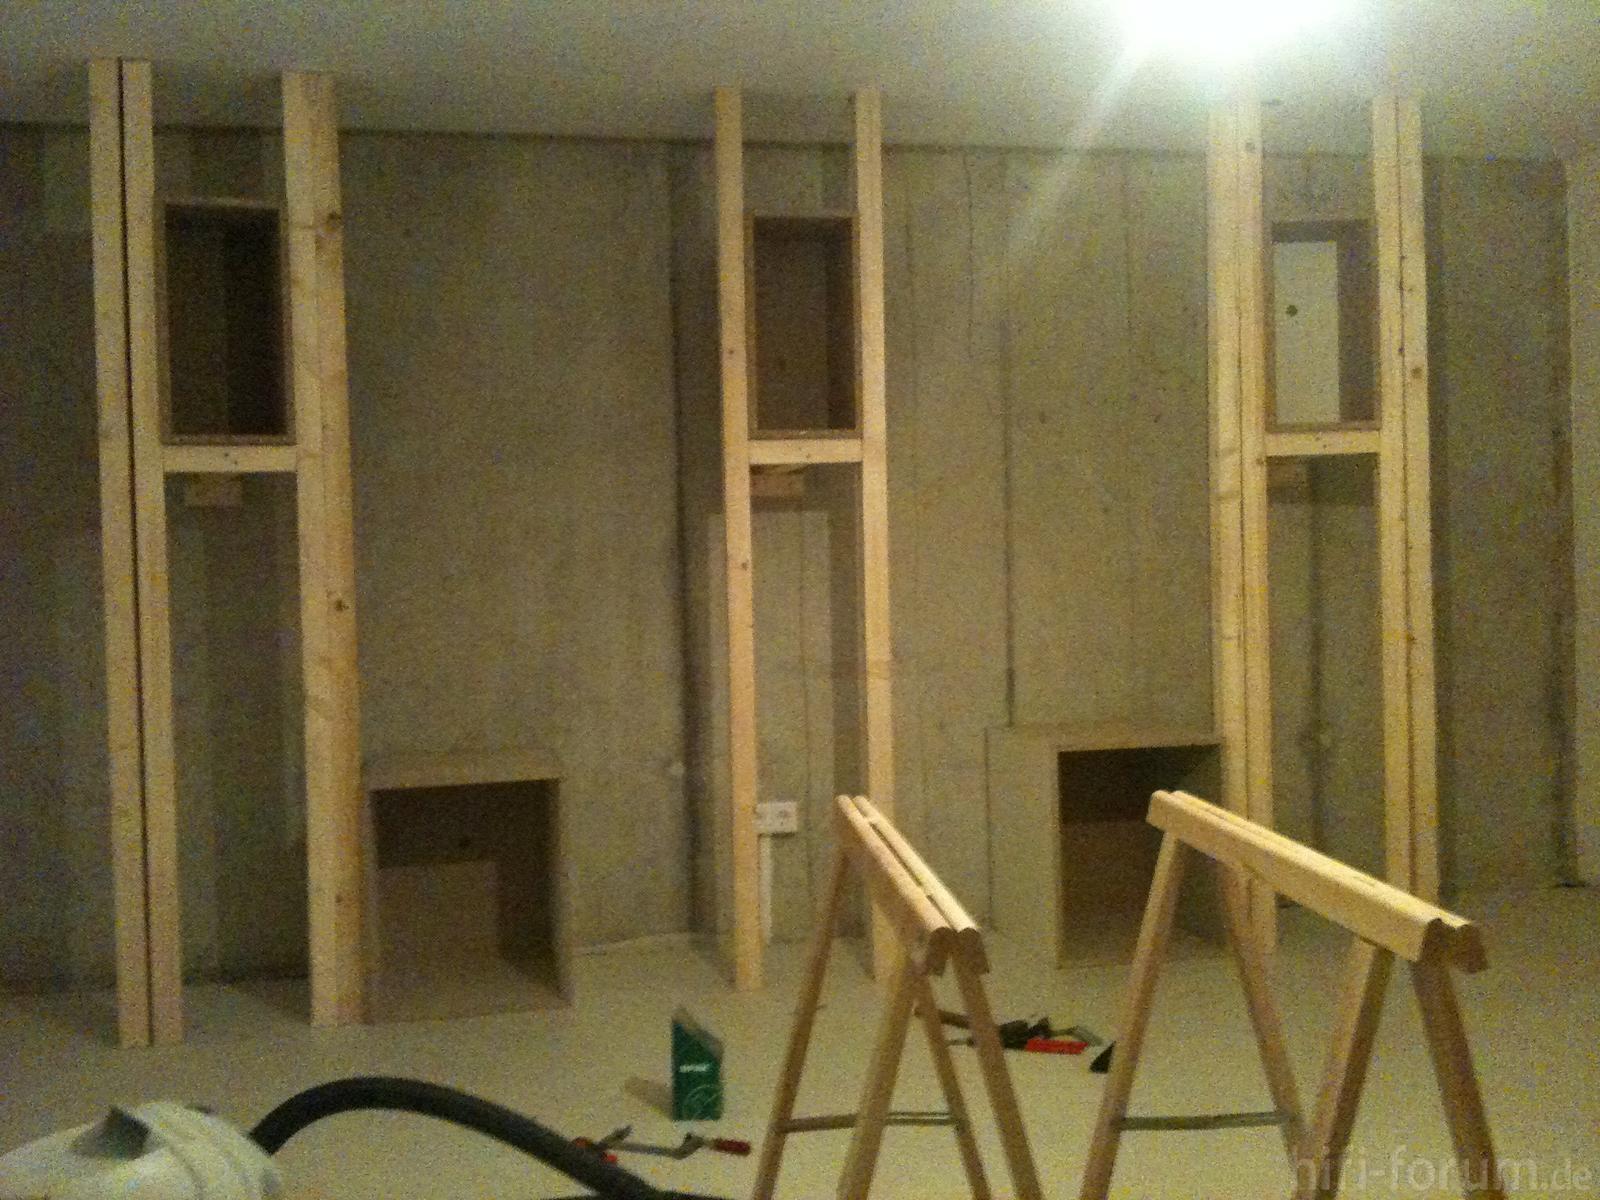 baffle wall gerust 1 205450 hifi bildergalerie. Black Bedroom Furniture Sets. Home Design Ideas